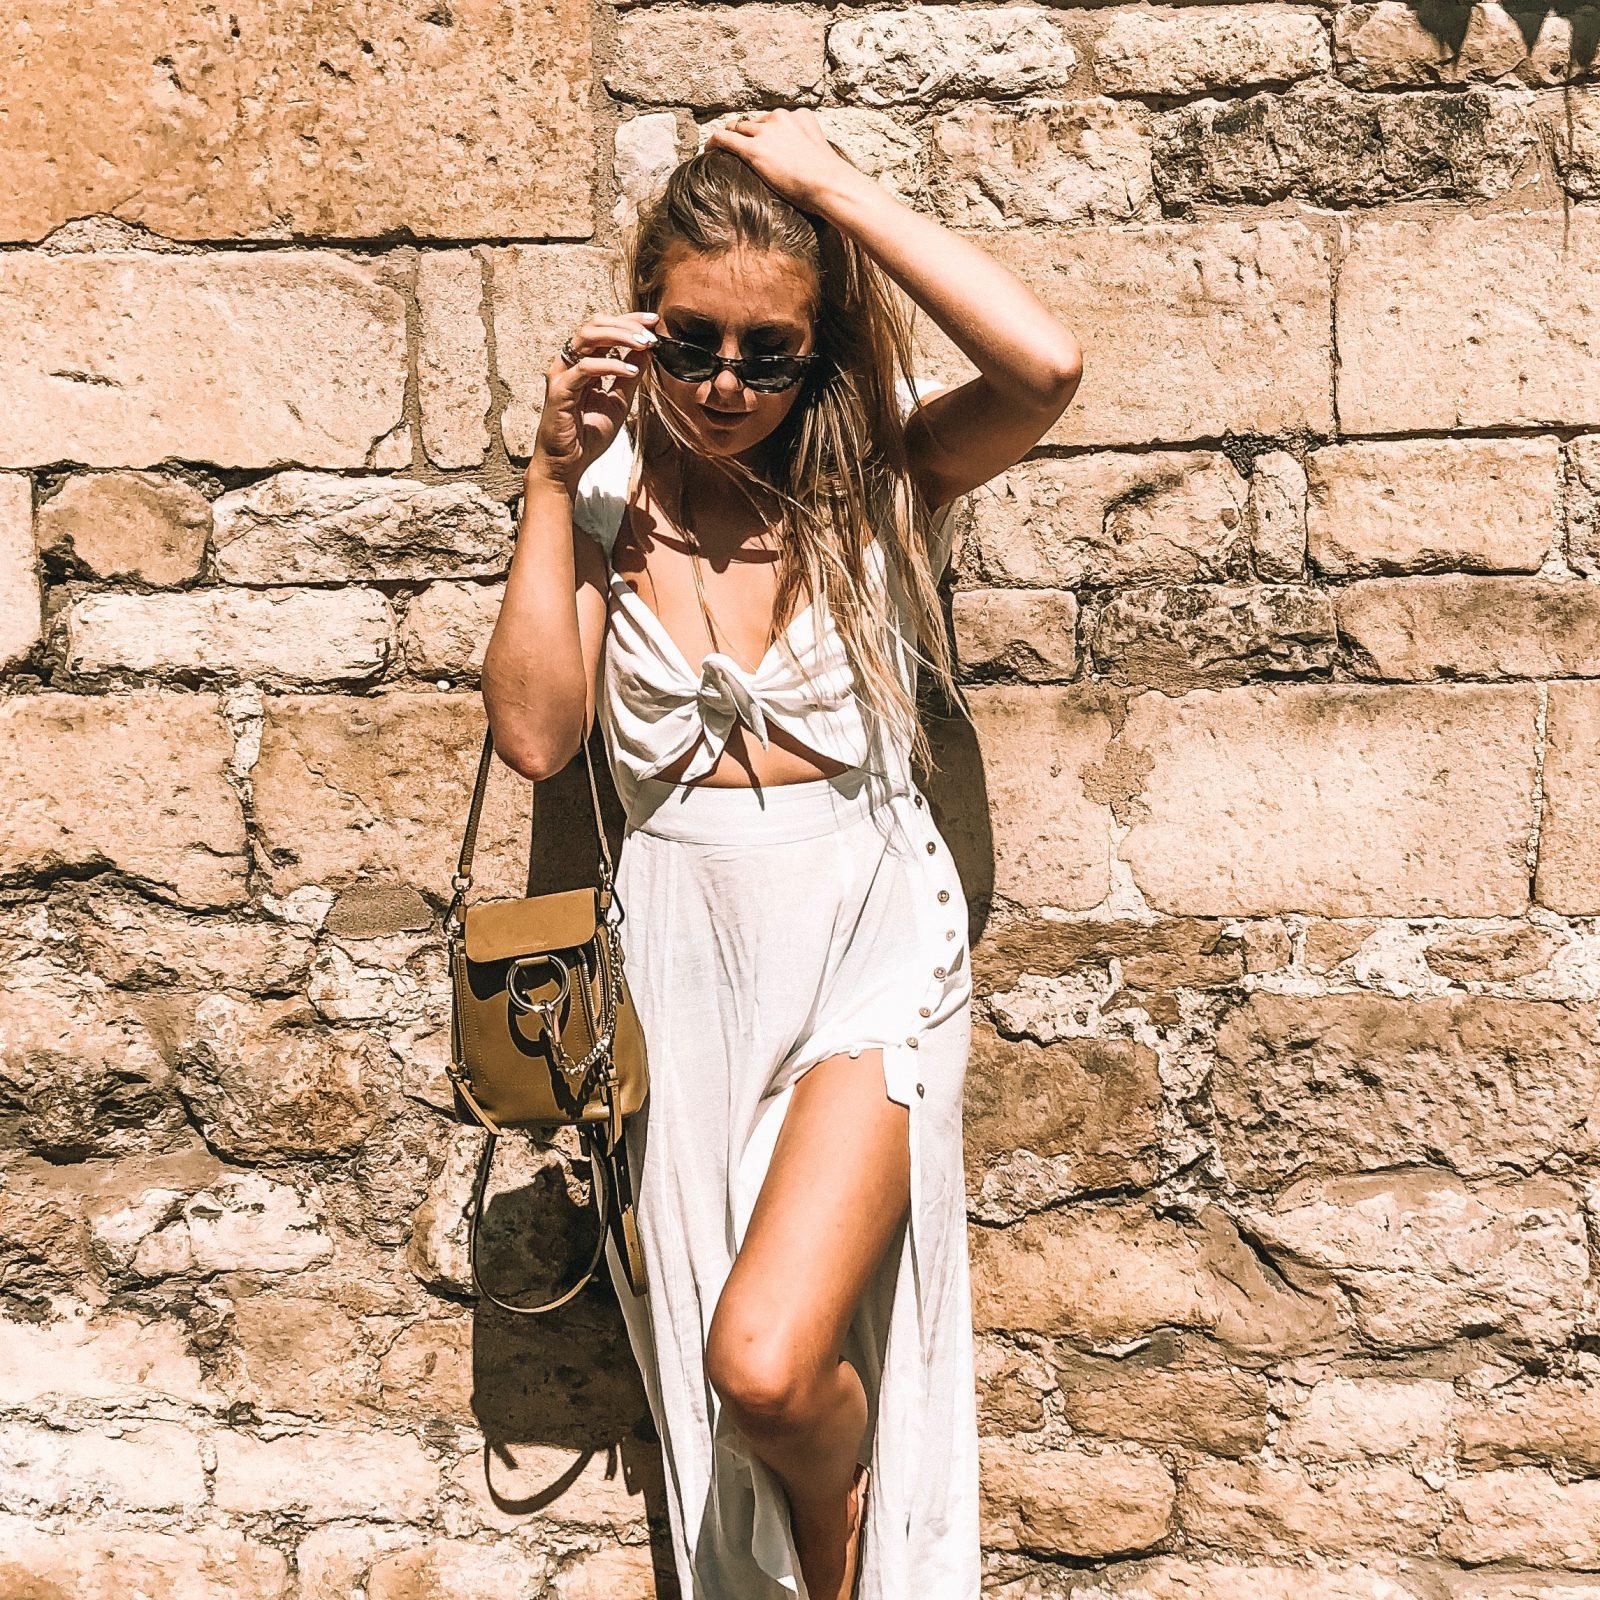 Free People Summer Dress - Free People Getaway Dress - Fashion Blogger Sinead Crowe